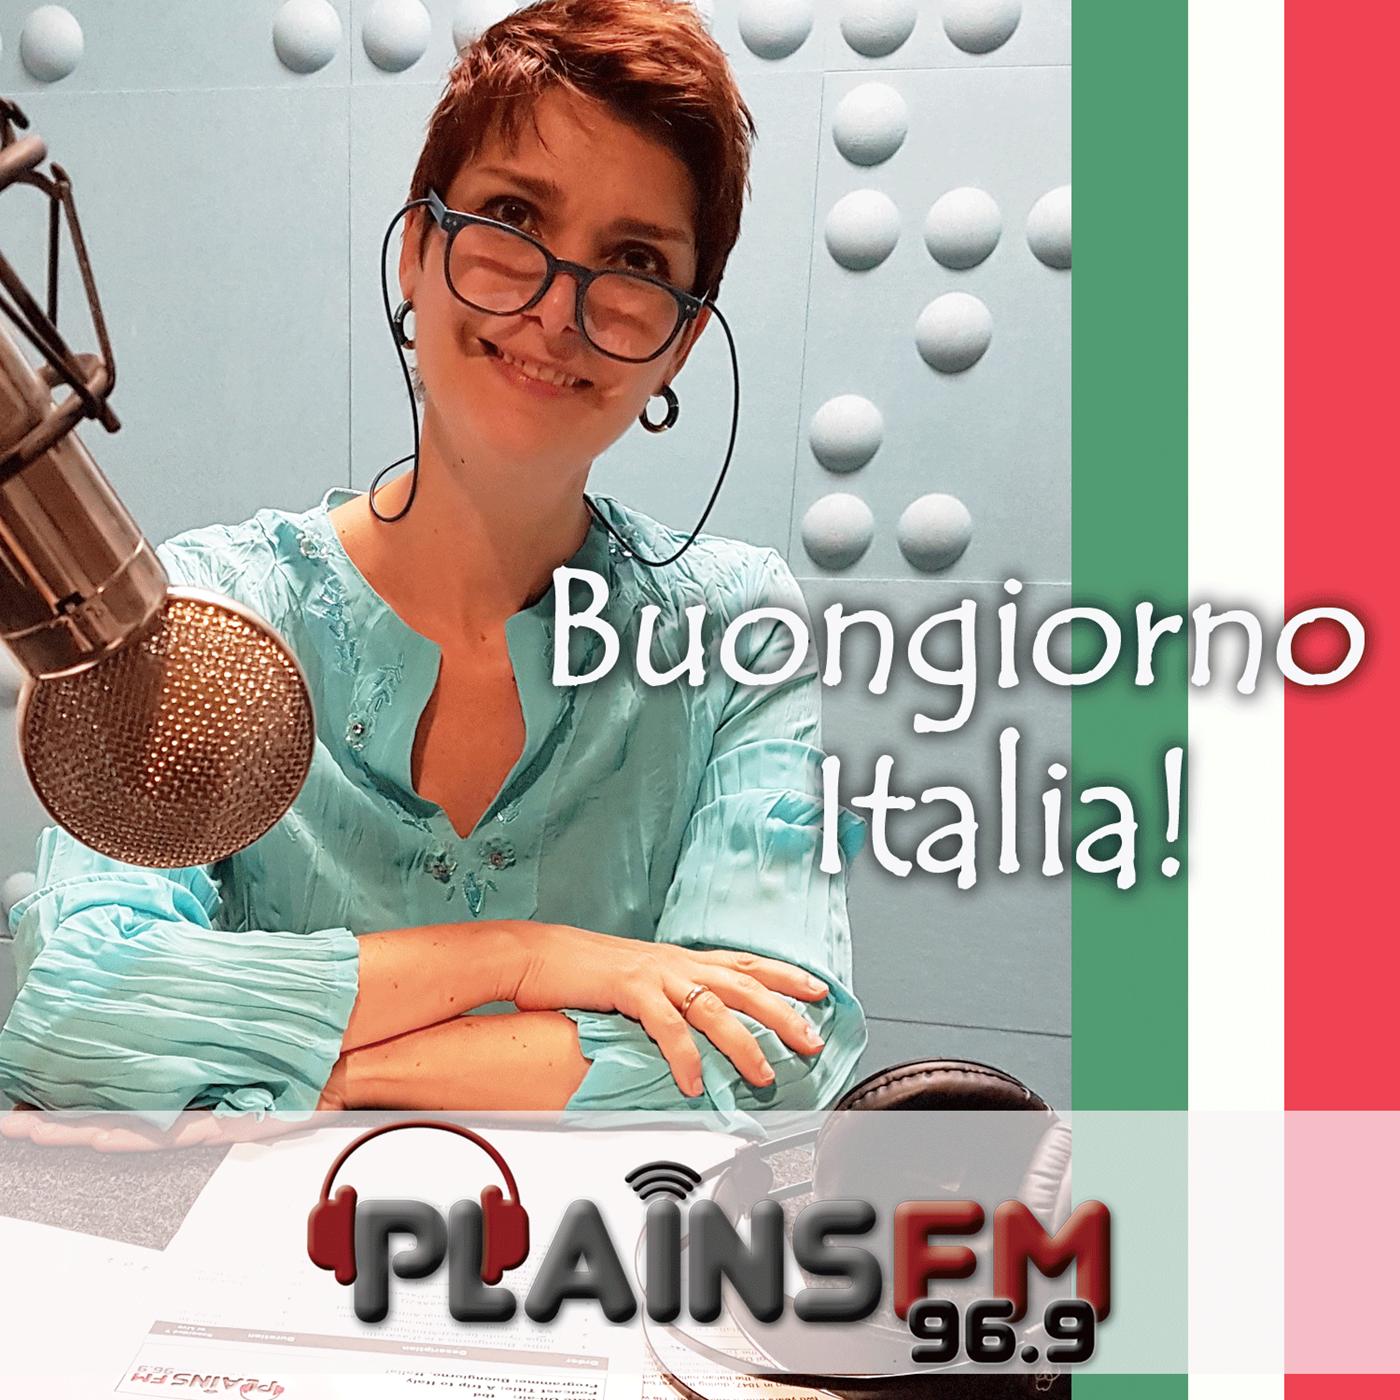 https://cdn.accessradio.org/StationFolder/plainsfm/Images/BuongiornoItalia.png